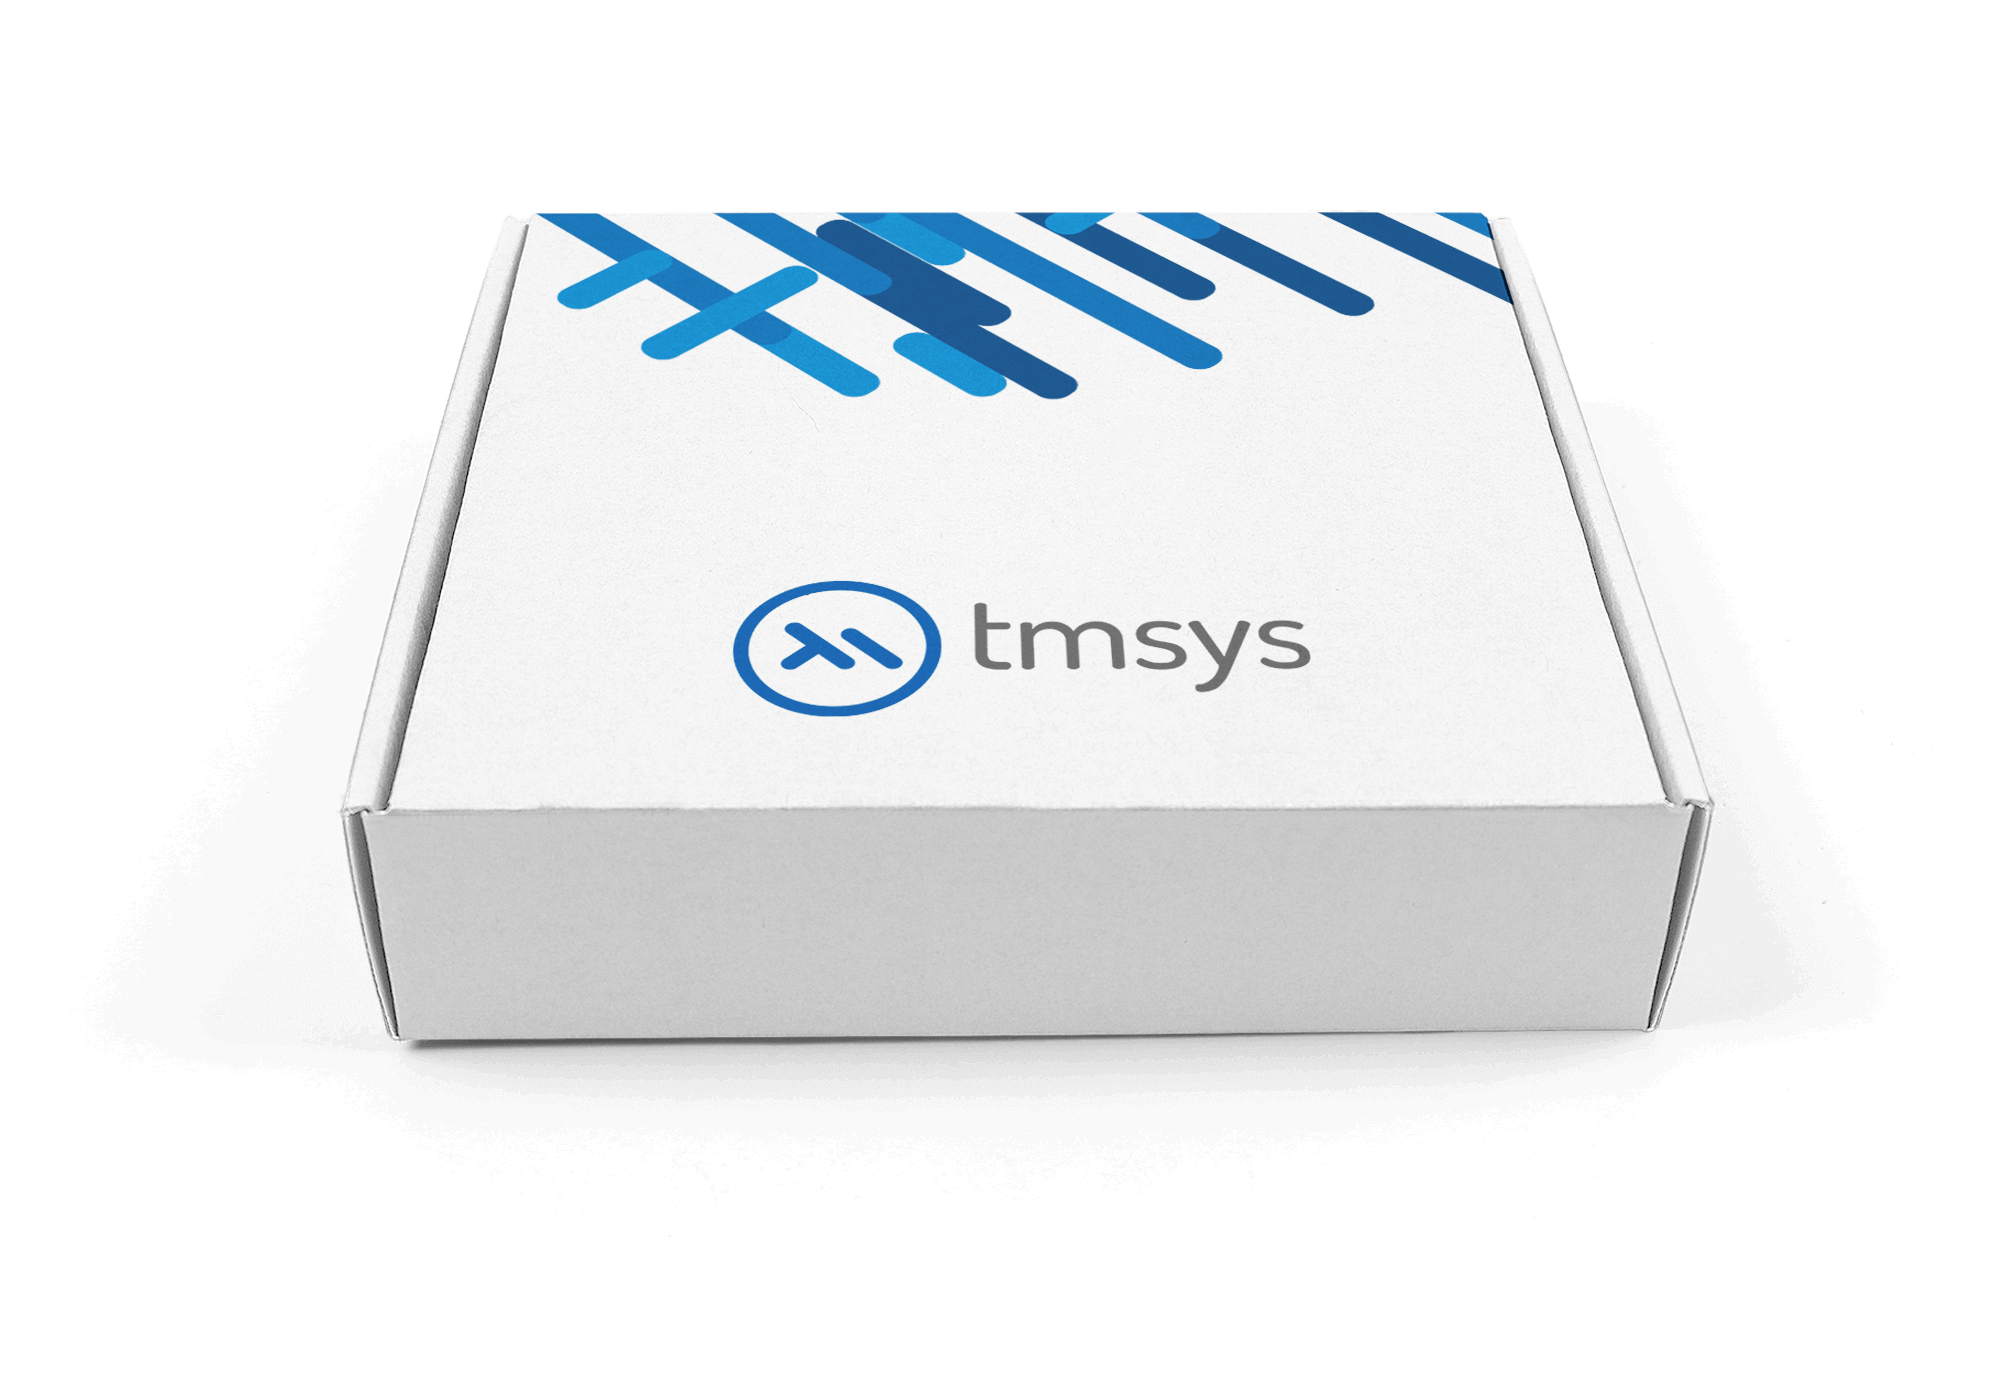 box tmsys (1)